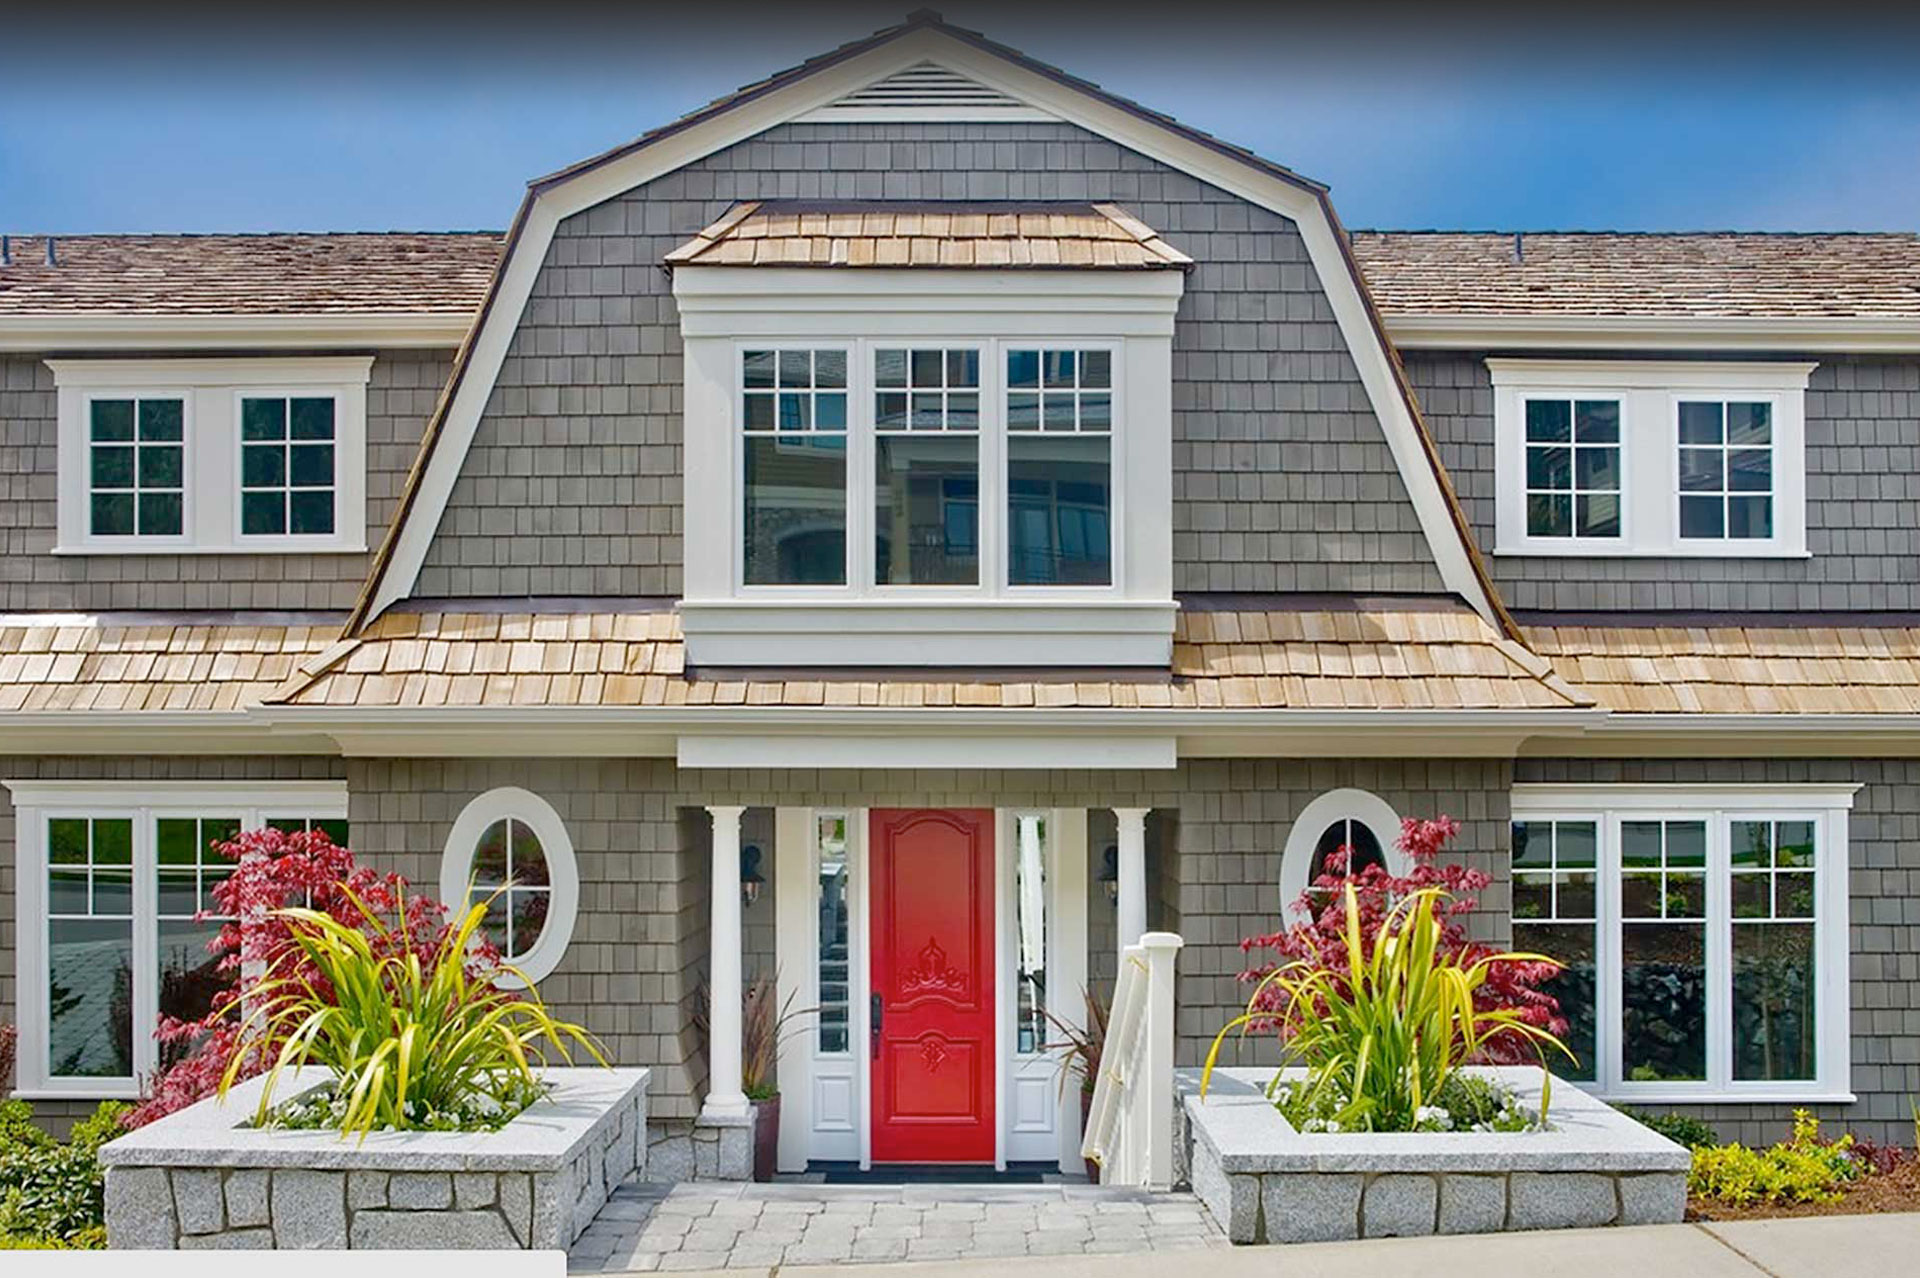 Nice Best Kitchen Gallery: Design Guild Homes Home Design Ideas Silverhoarders  Of Design Guild Homes On